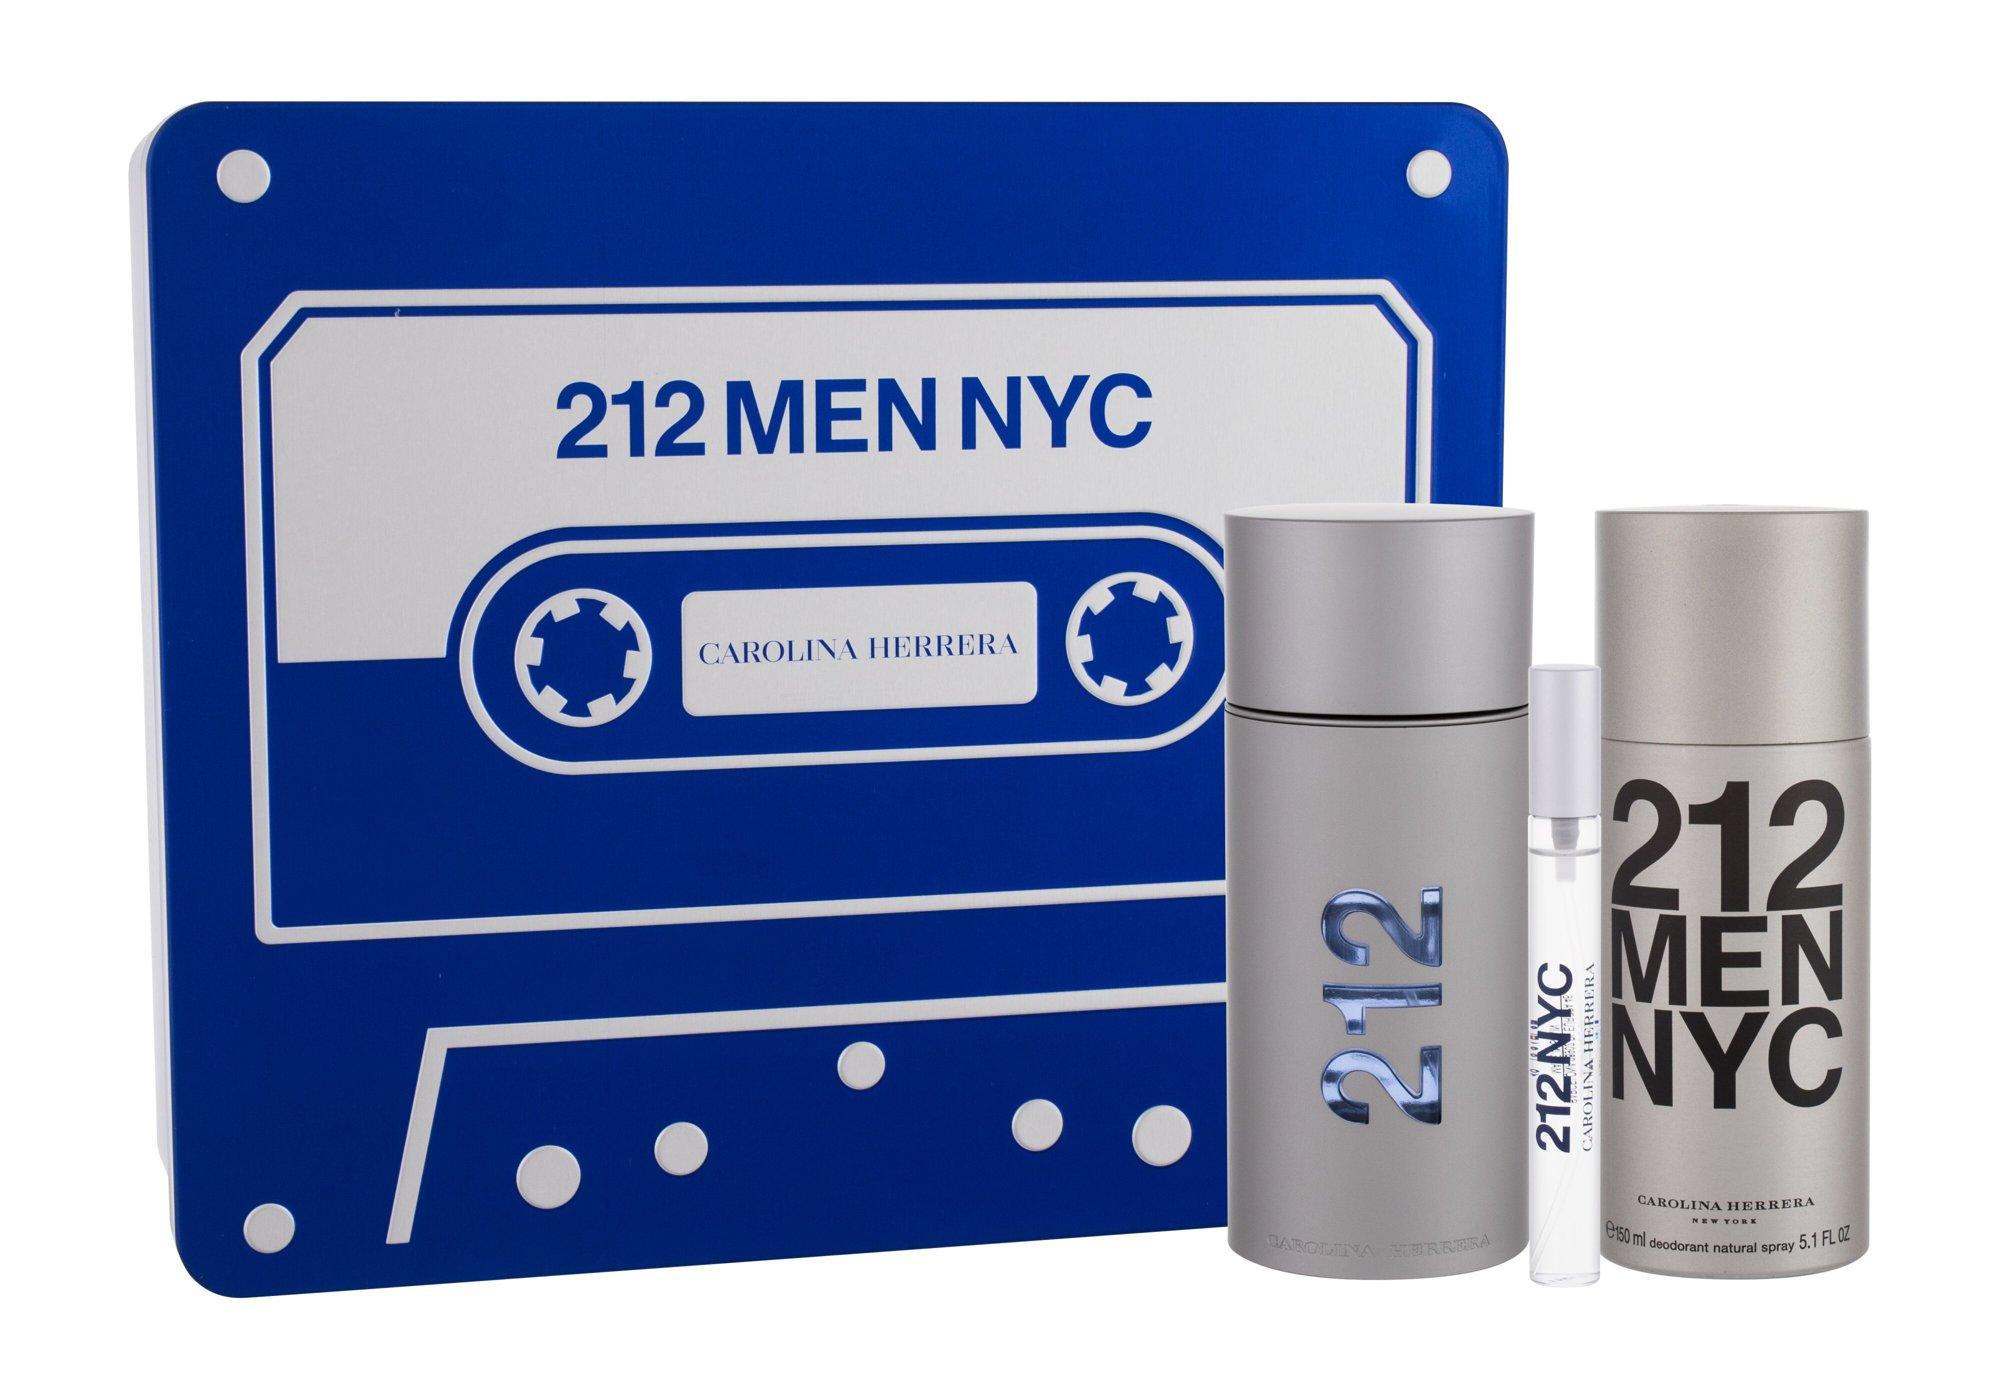 Carolina Herrera 212 NYC Men, edt 100 ml + Dezodor 150 ml + edt 10 ml